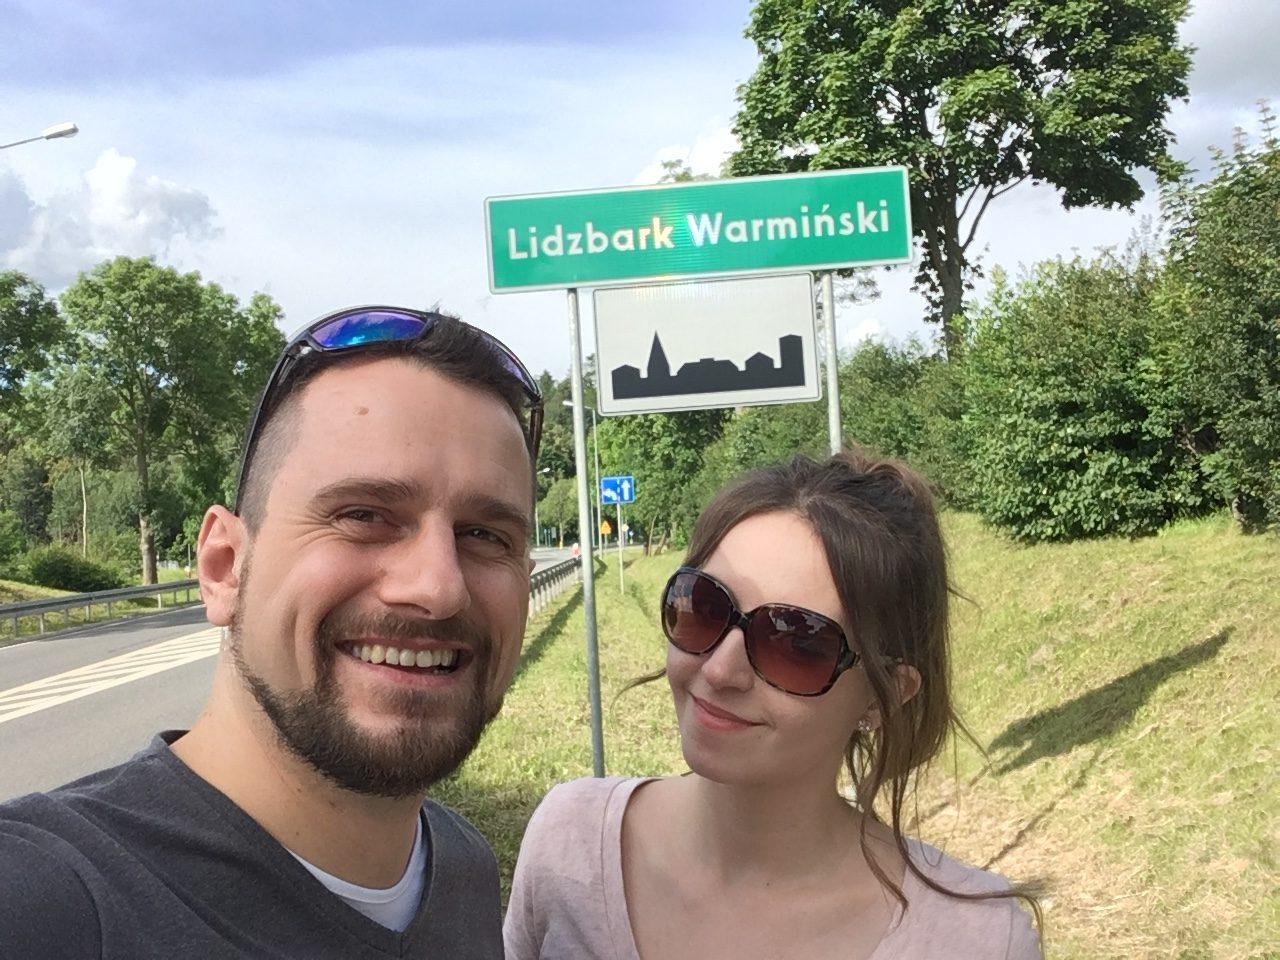 Lidzbark Warmiński 2017